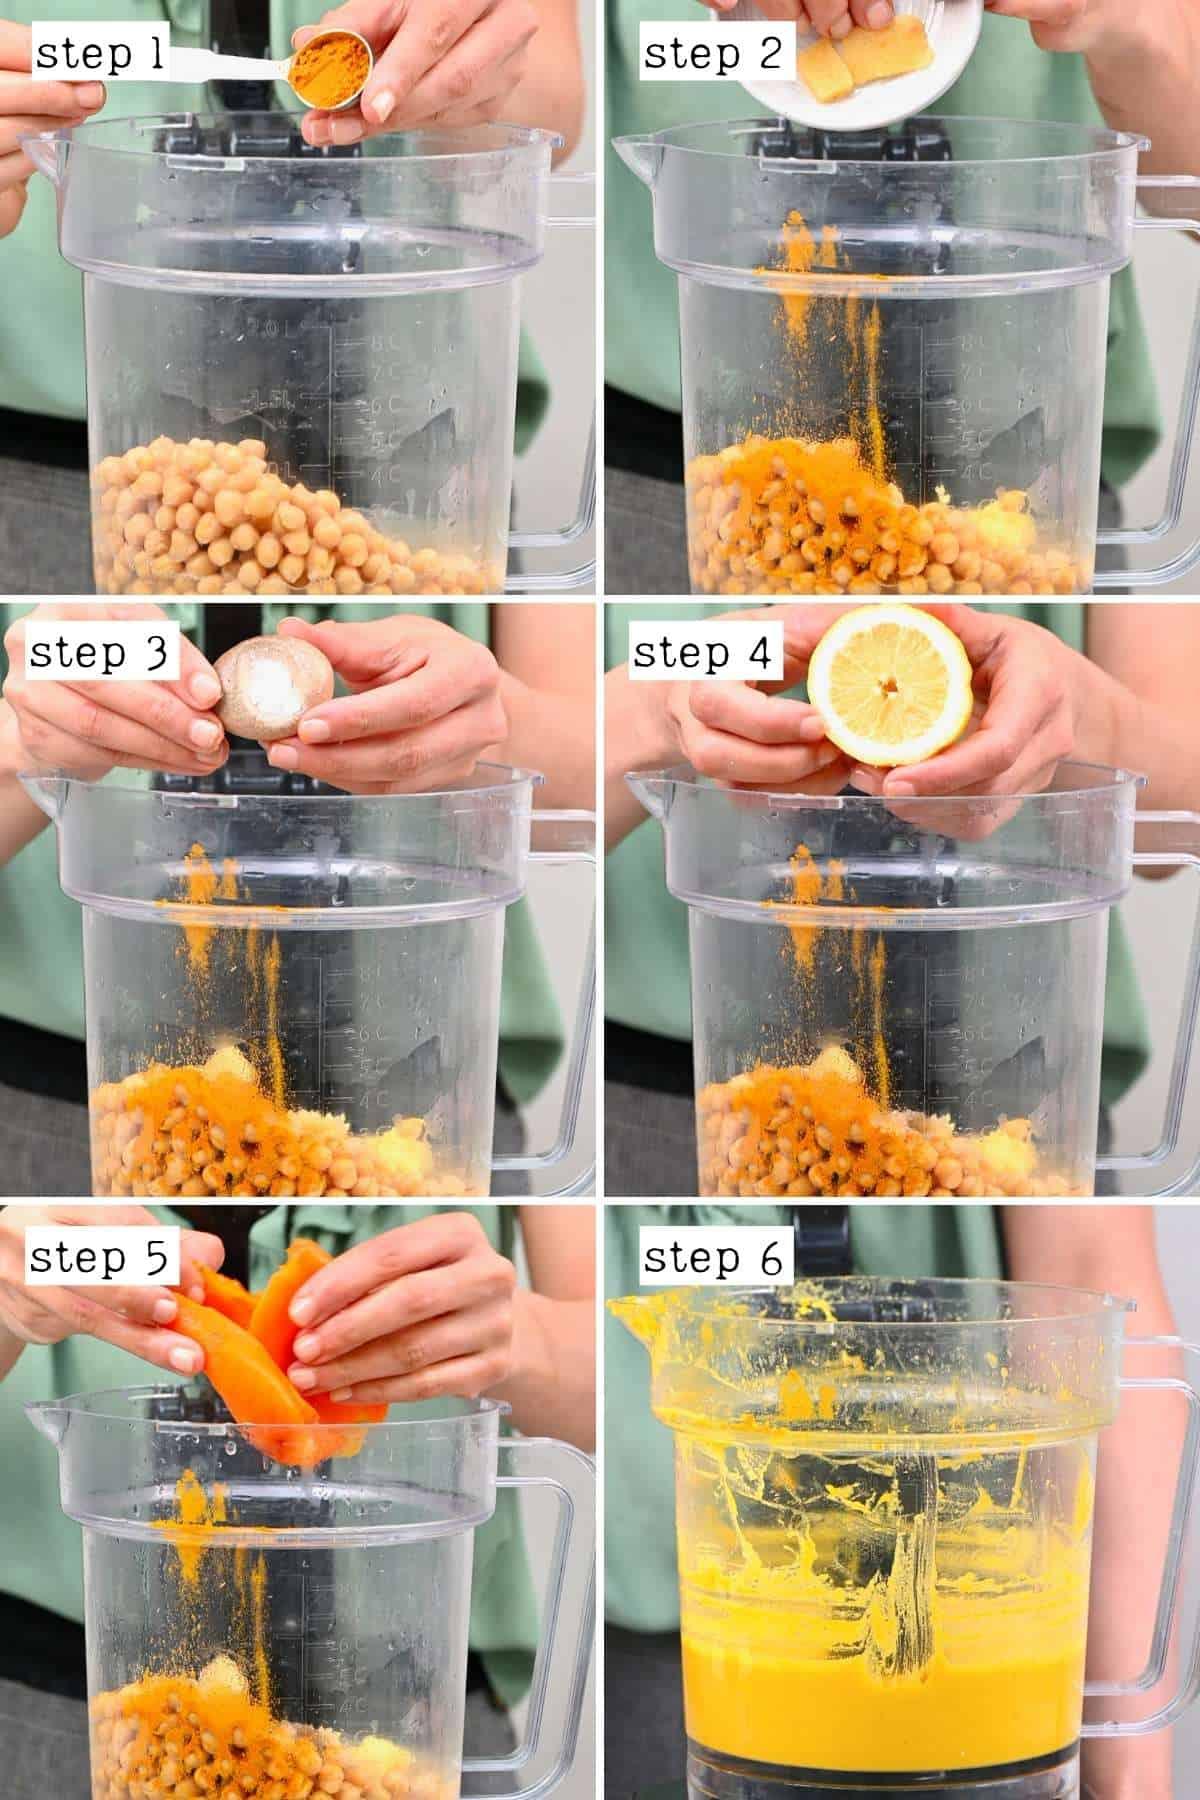 Steps for preparing turmeric hummus